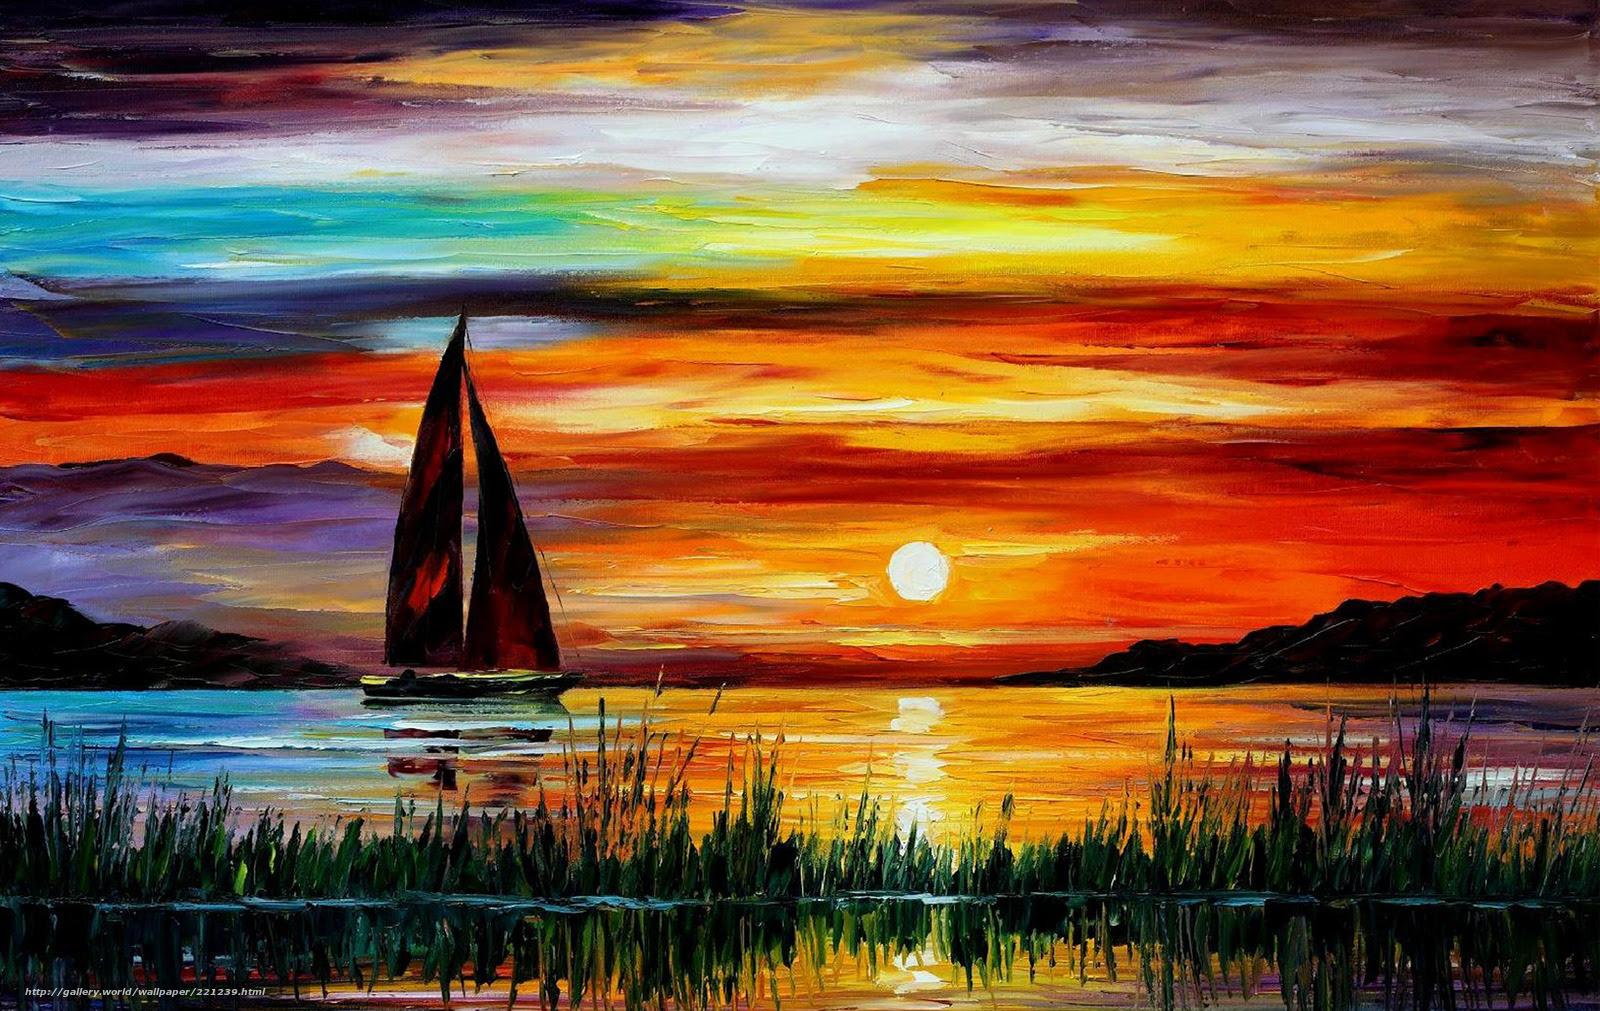 Download Wallpaper Sunset Sea Boat Picture Free Desktop